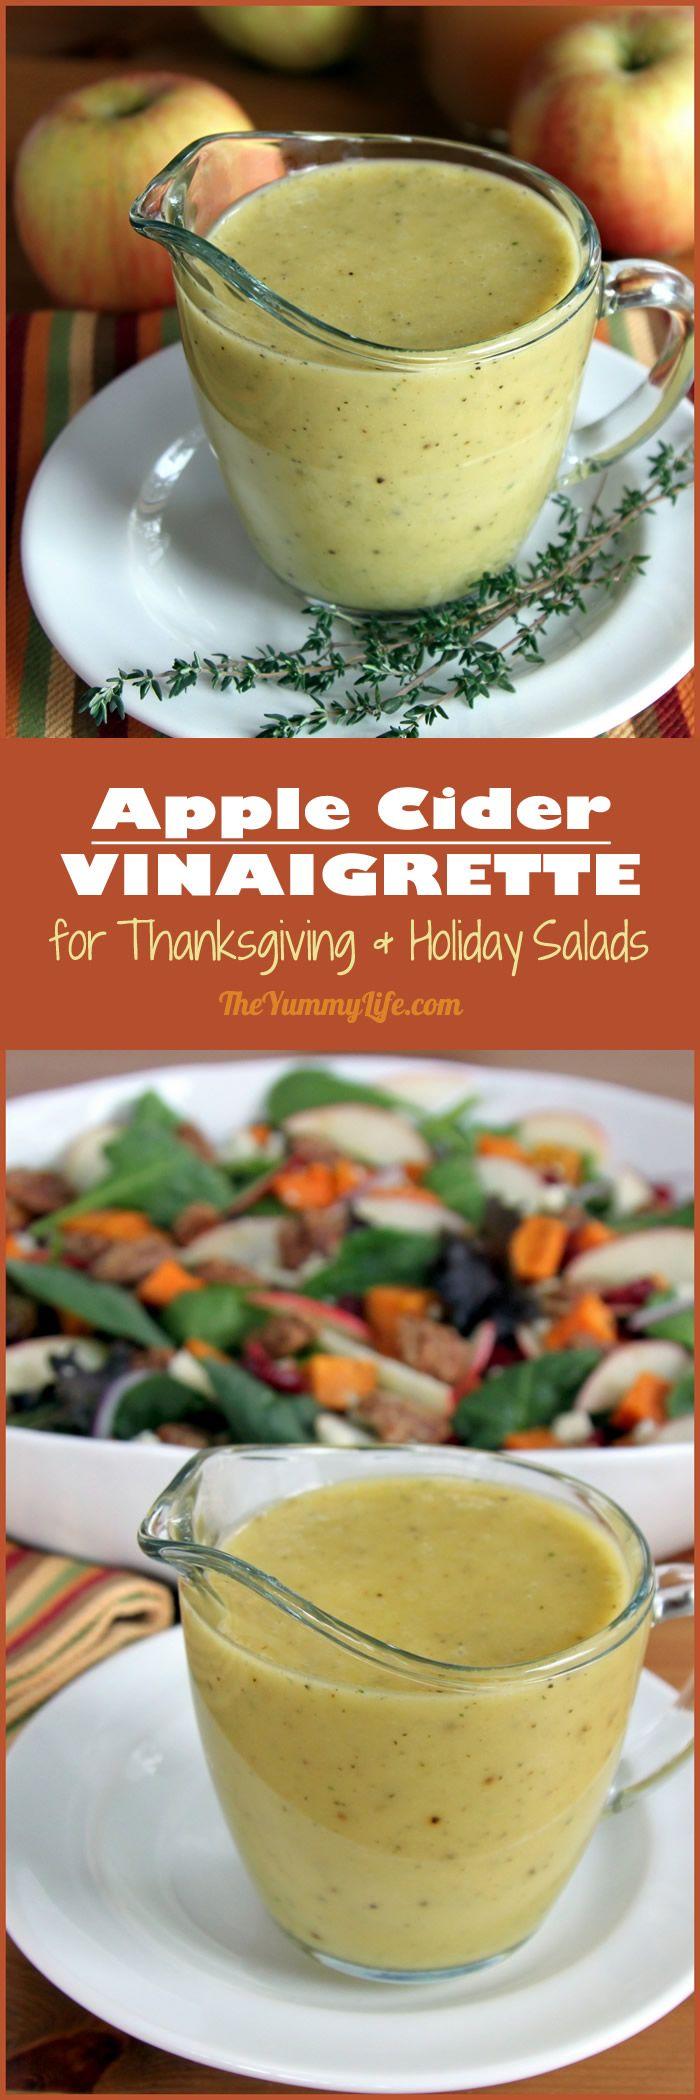 Apple Cider Vinaigrette For Dressing Autumn Salads